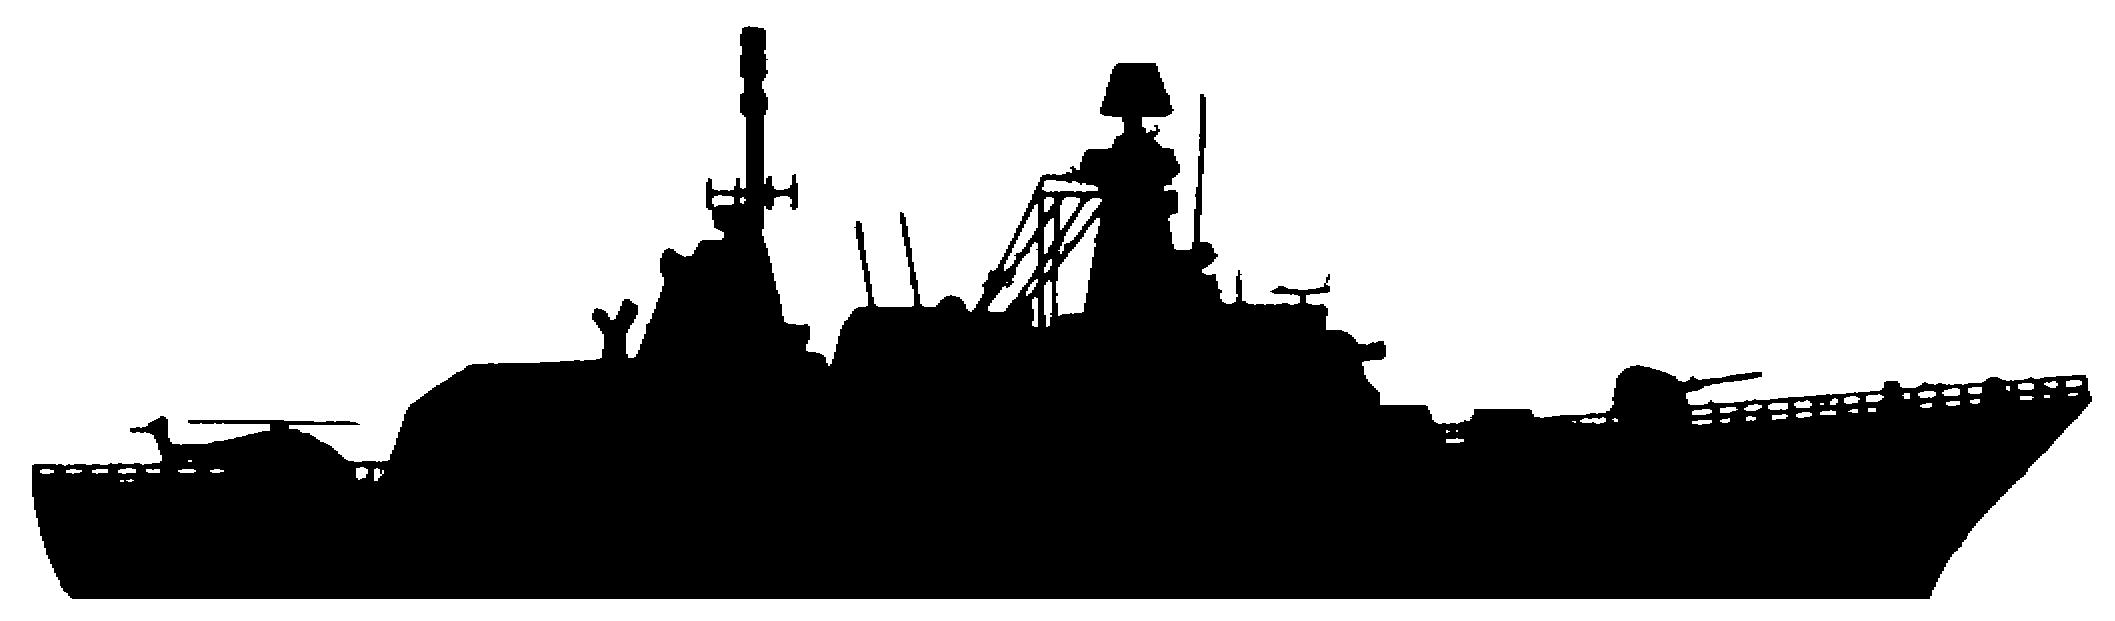 Battleship clipart Download Battleship Picture Clipartsgram Clipart